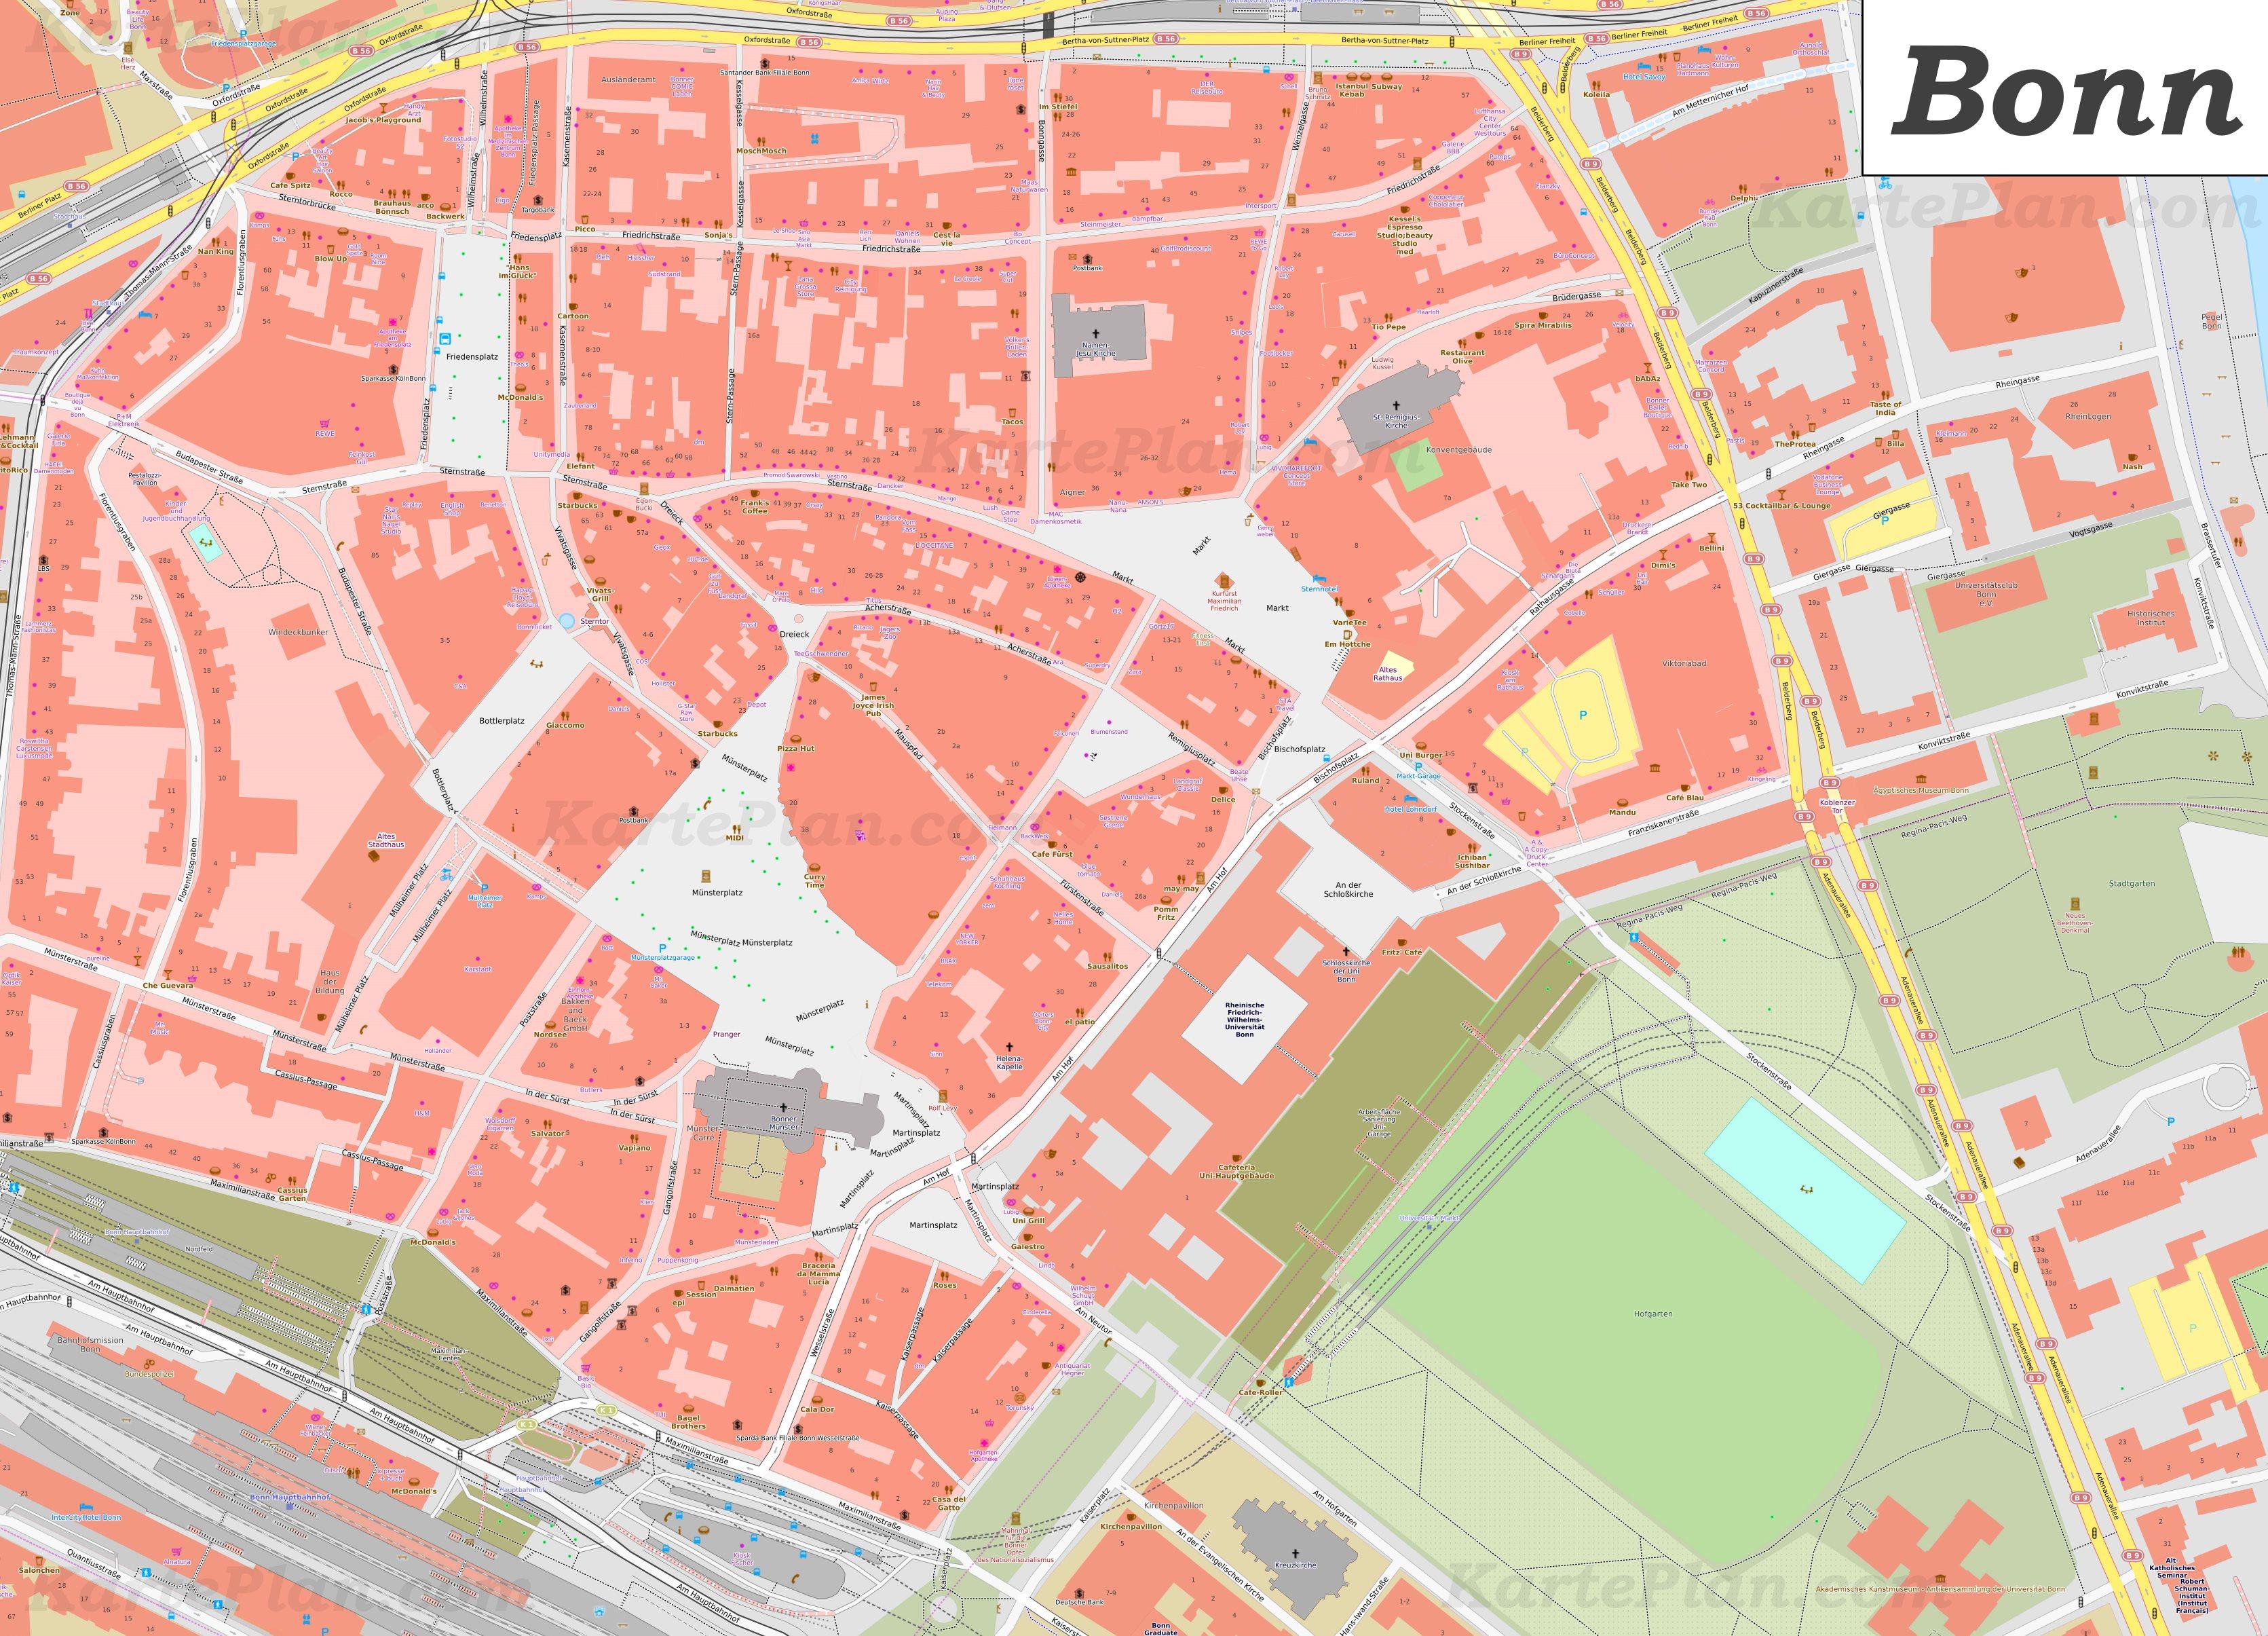 Bonn Karte.Karte Von Bonn Zentrum